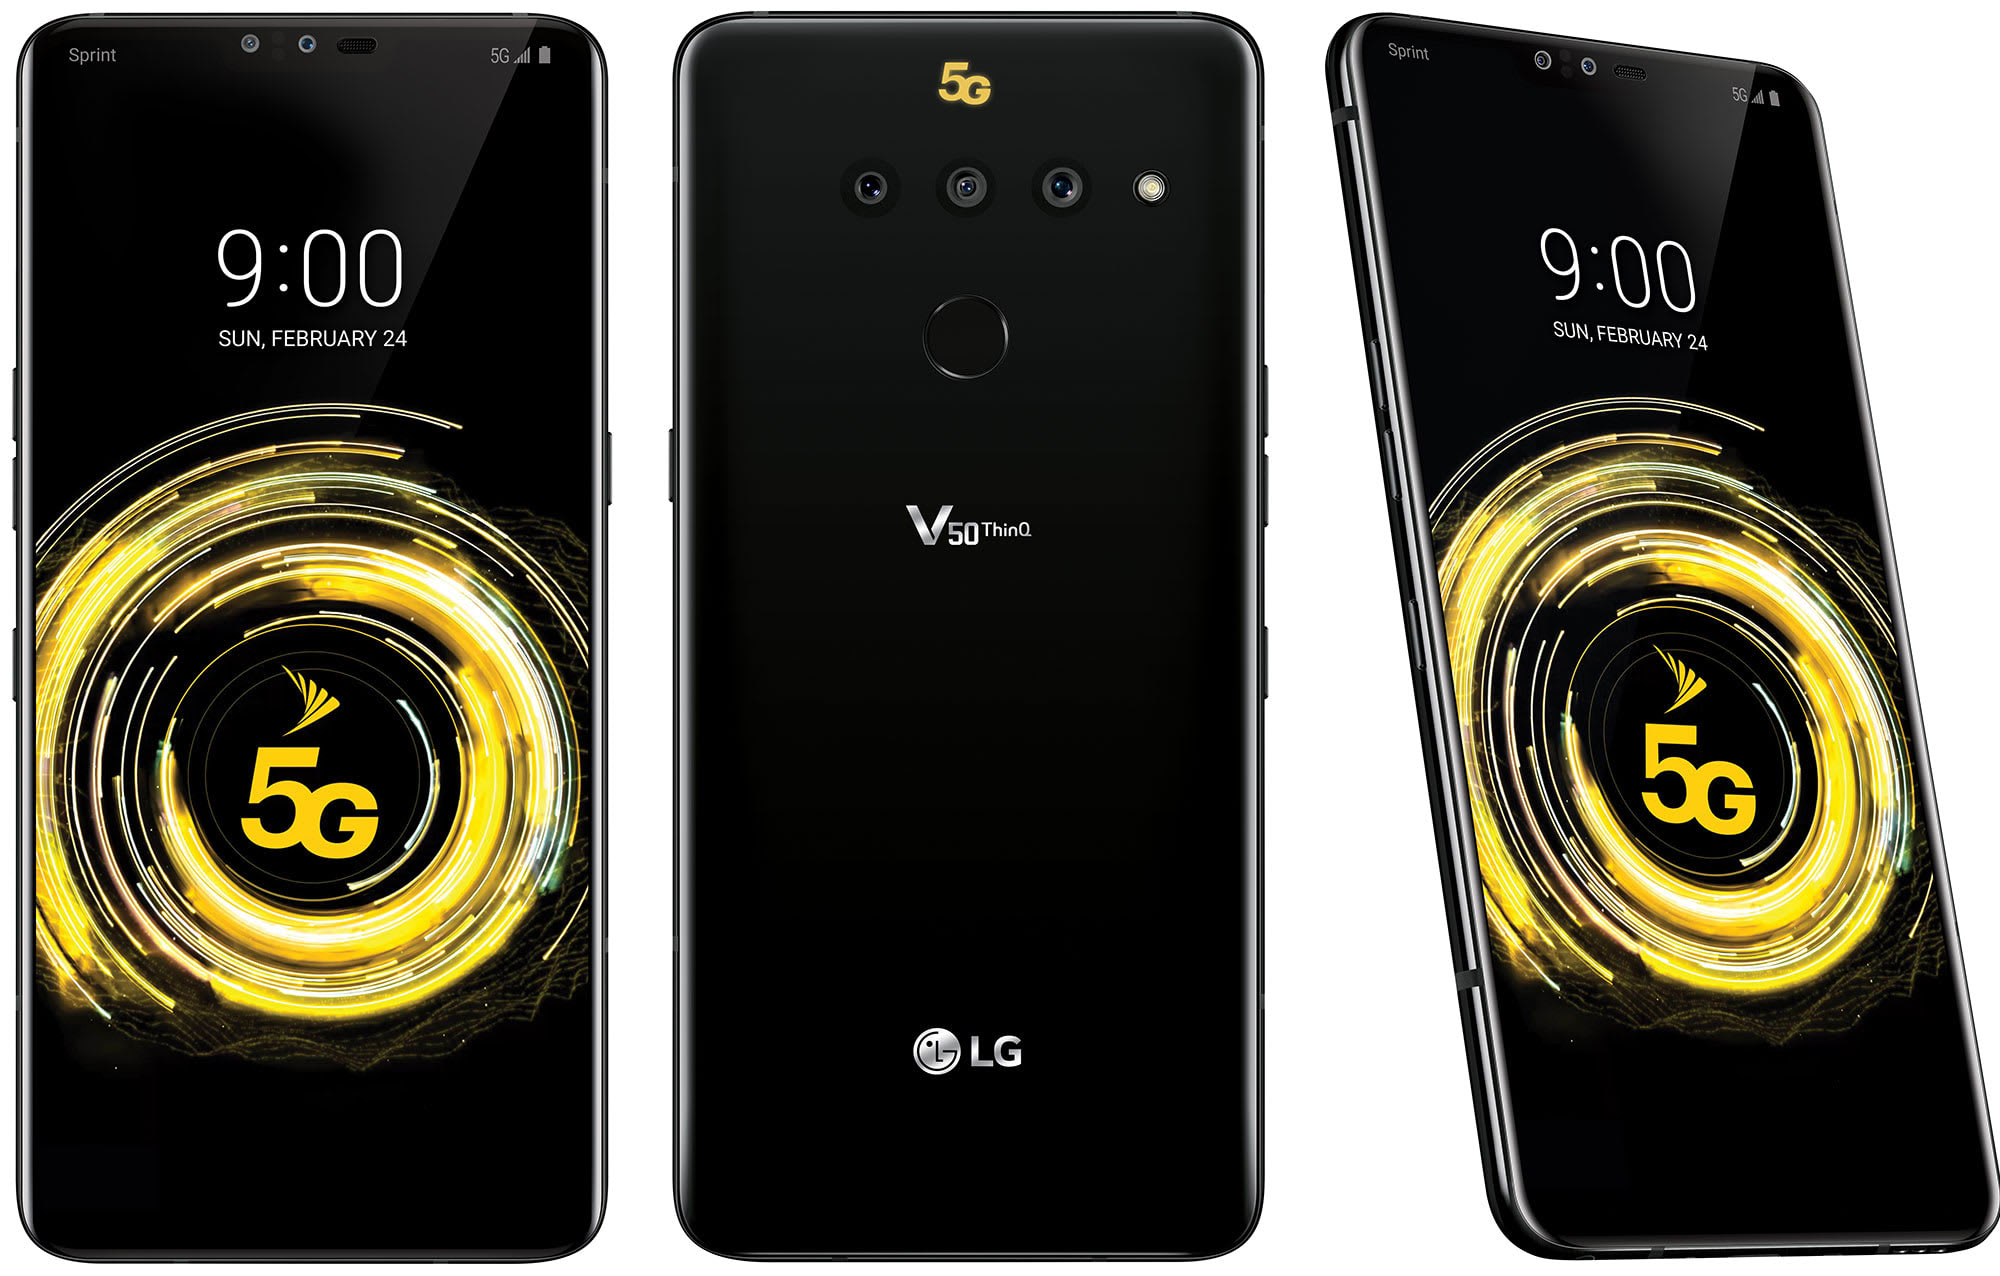 Image result for LG 5g